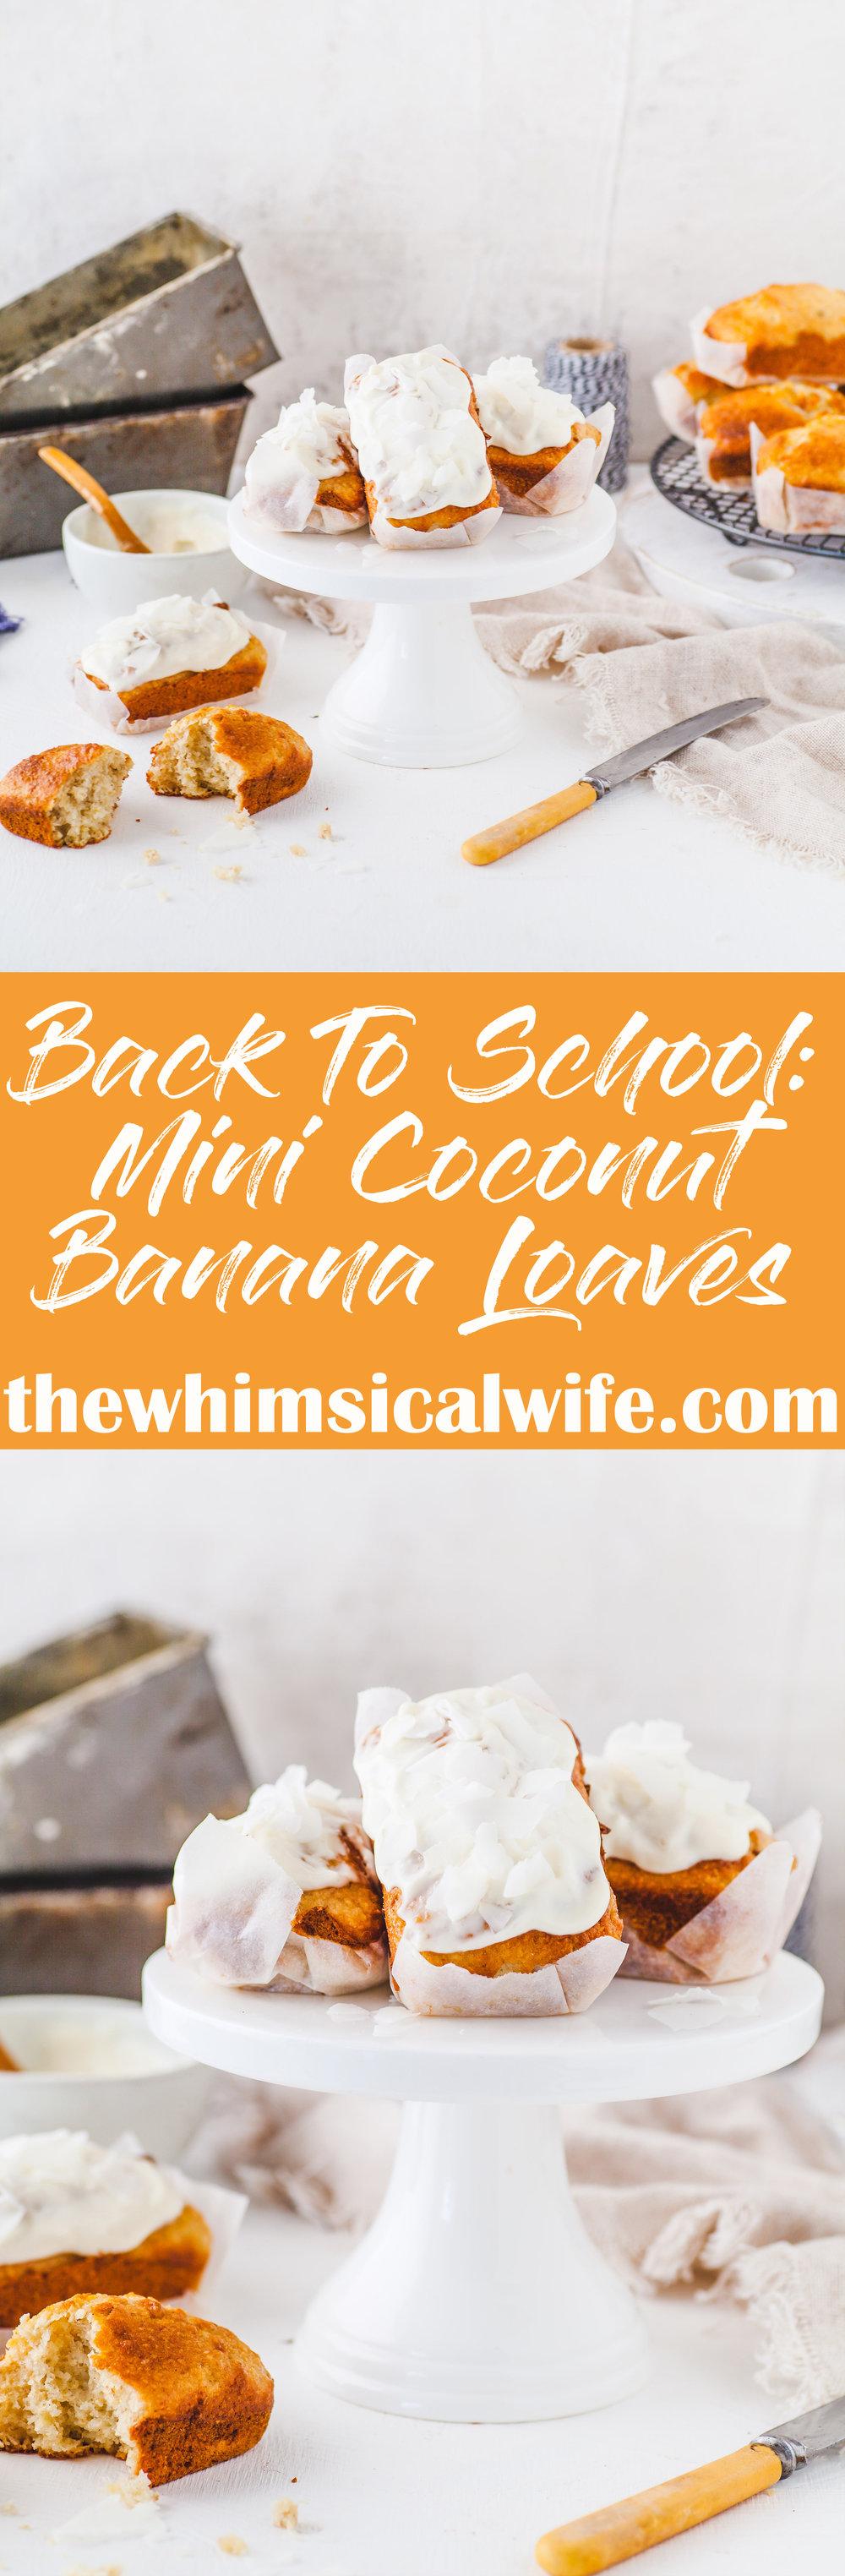 Back To School: Mini Coconut Banana Bread {Dairy & Nut Free}